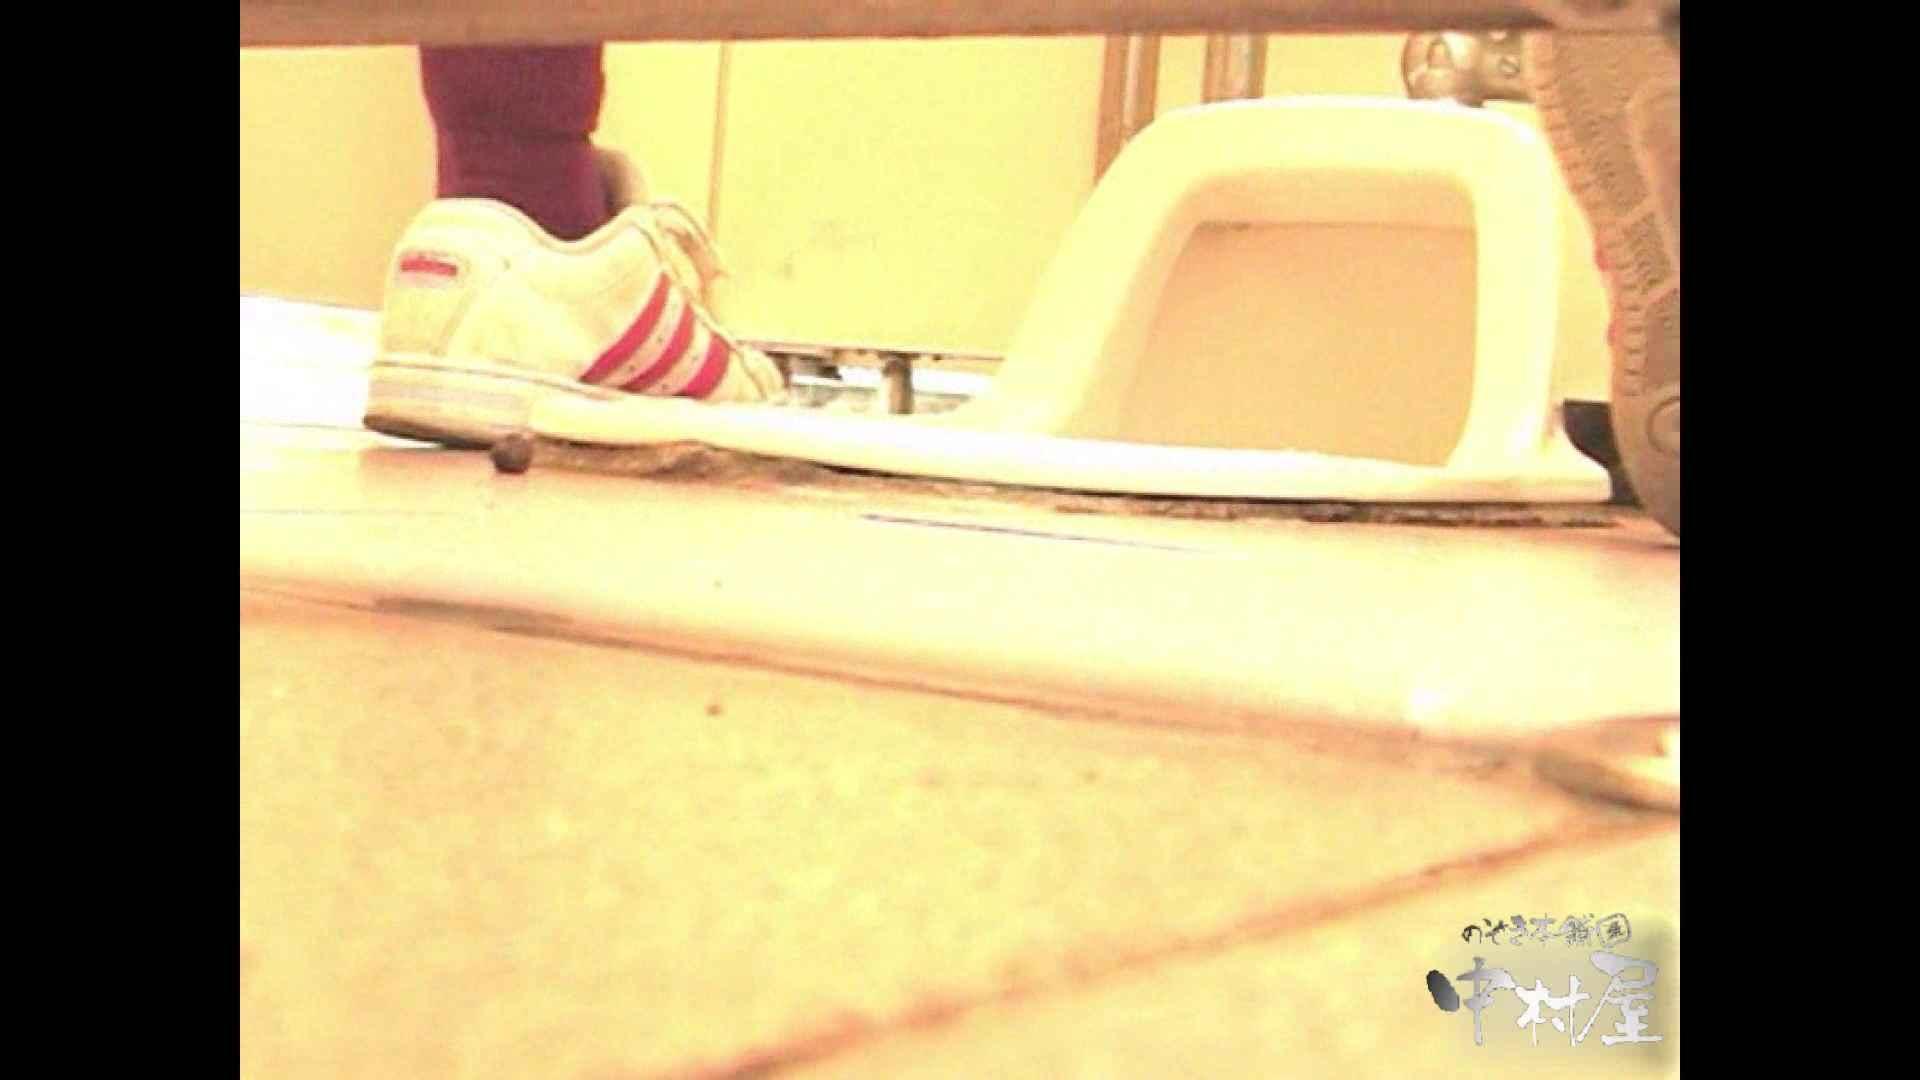 岩手県在住盗撮師盗撮記録vol.02 マンコ オマンコ無修正動画無料 38枚